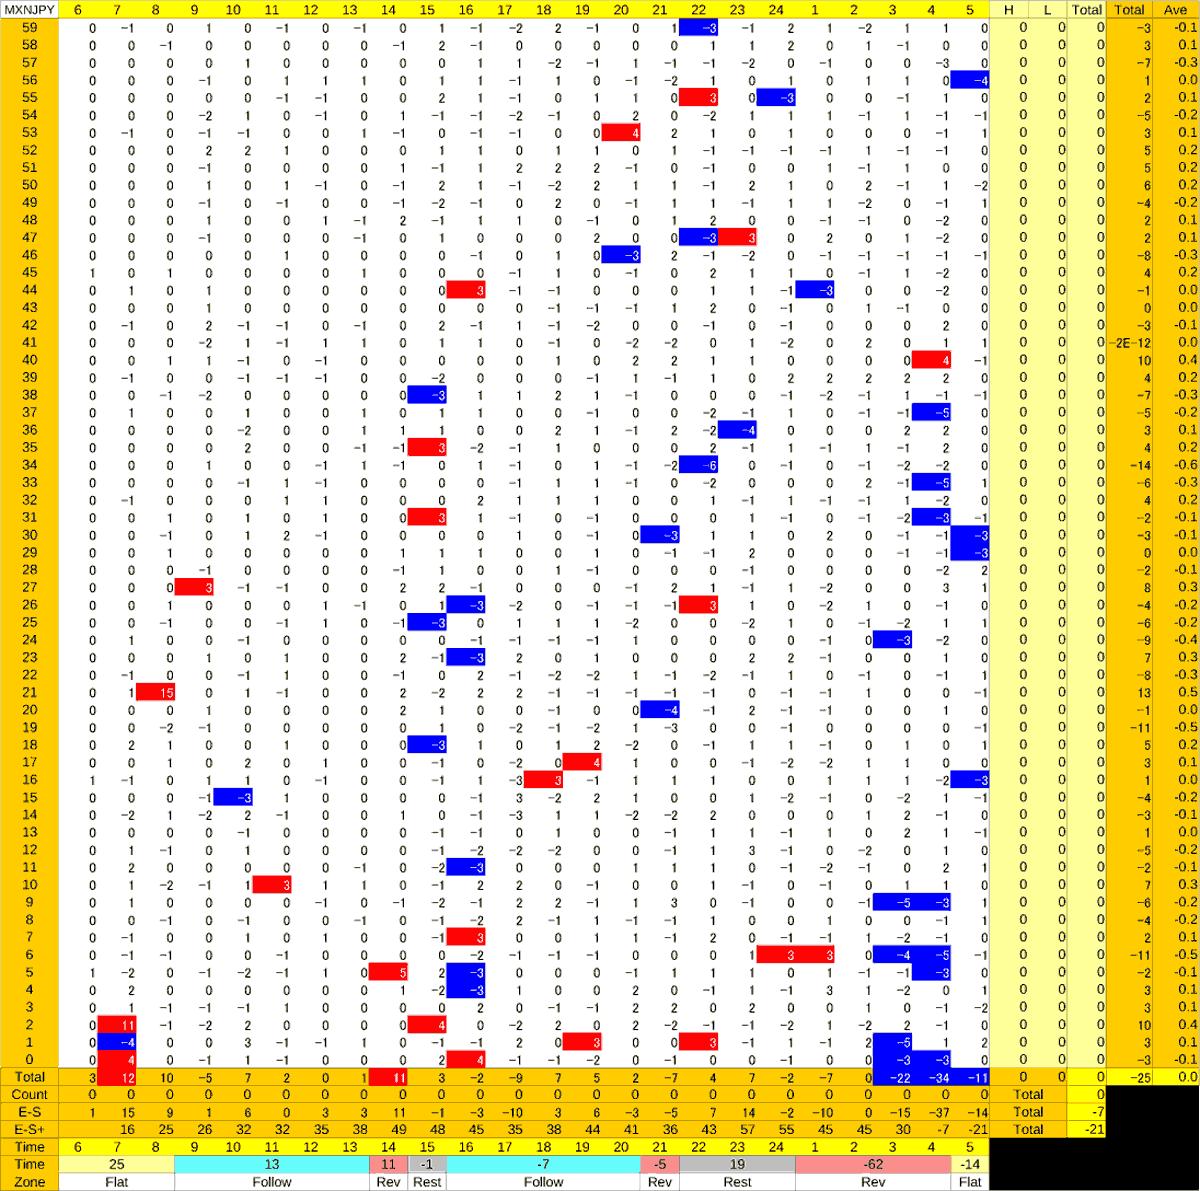 20200713_HS(3)MXNJPY